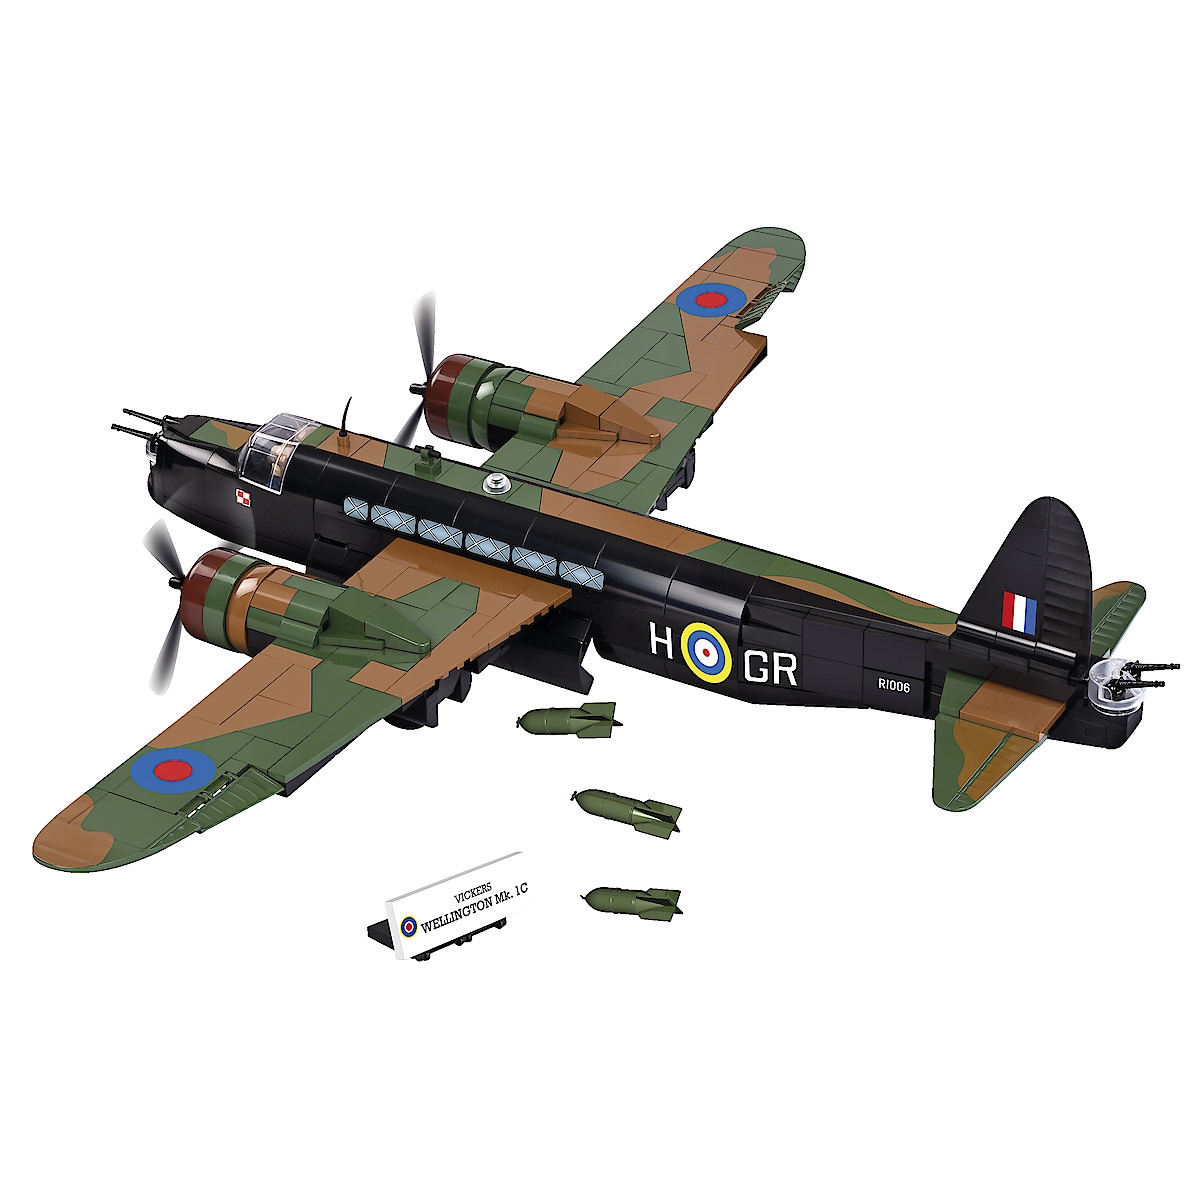 Bausteine Cobi, Vickers Wellington Mk.1C